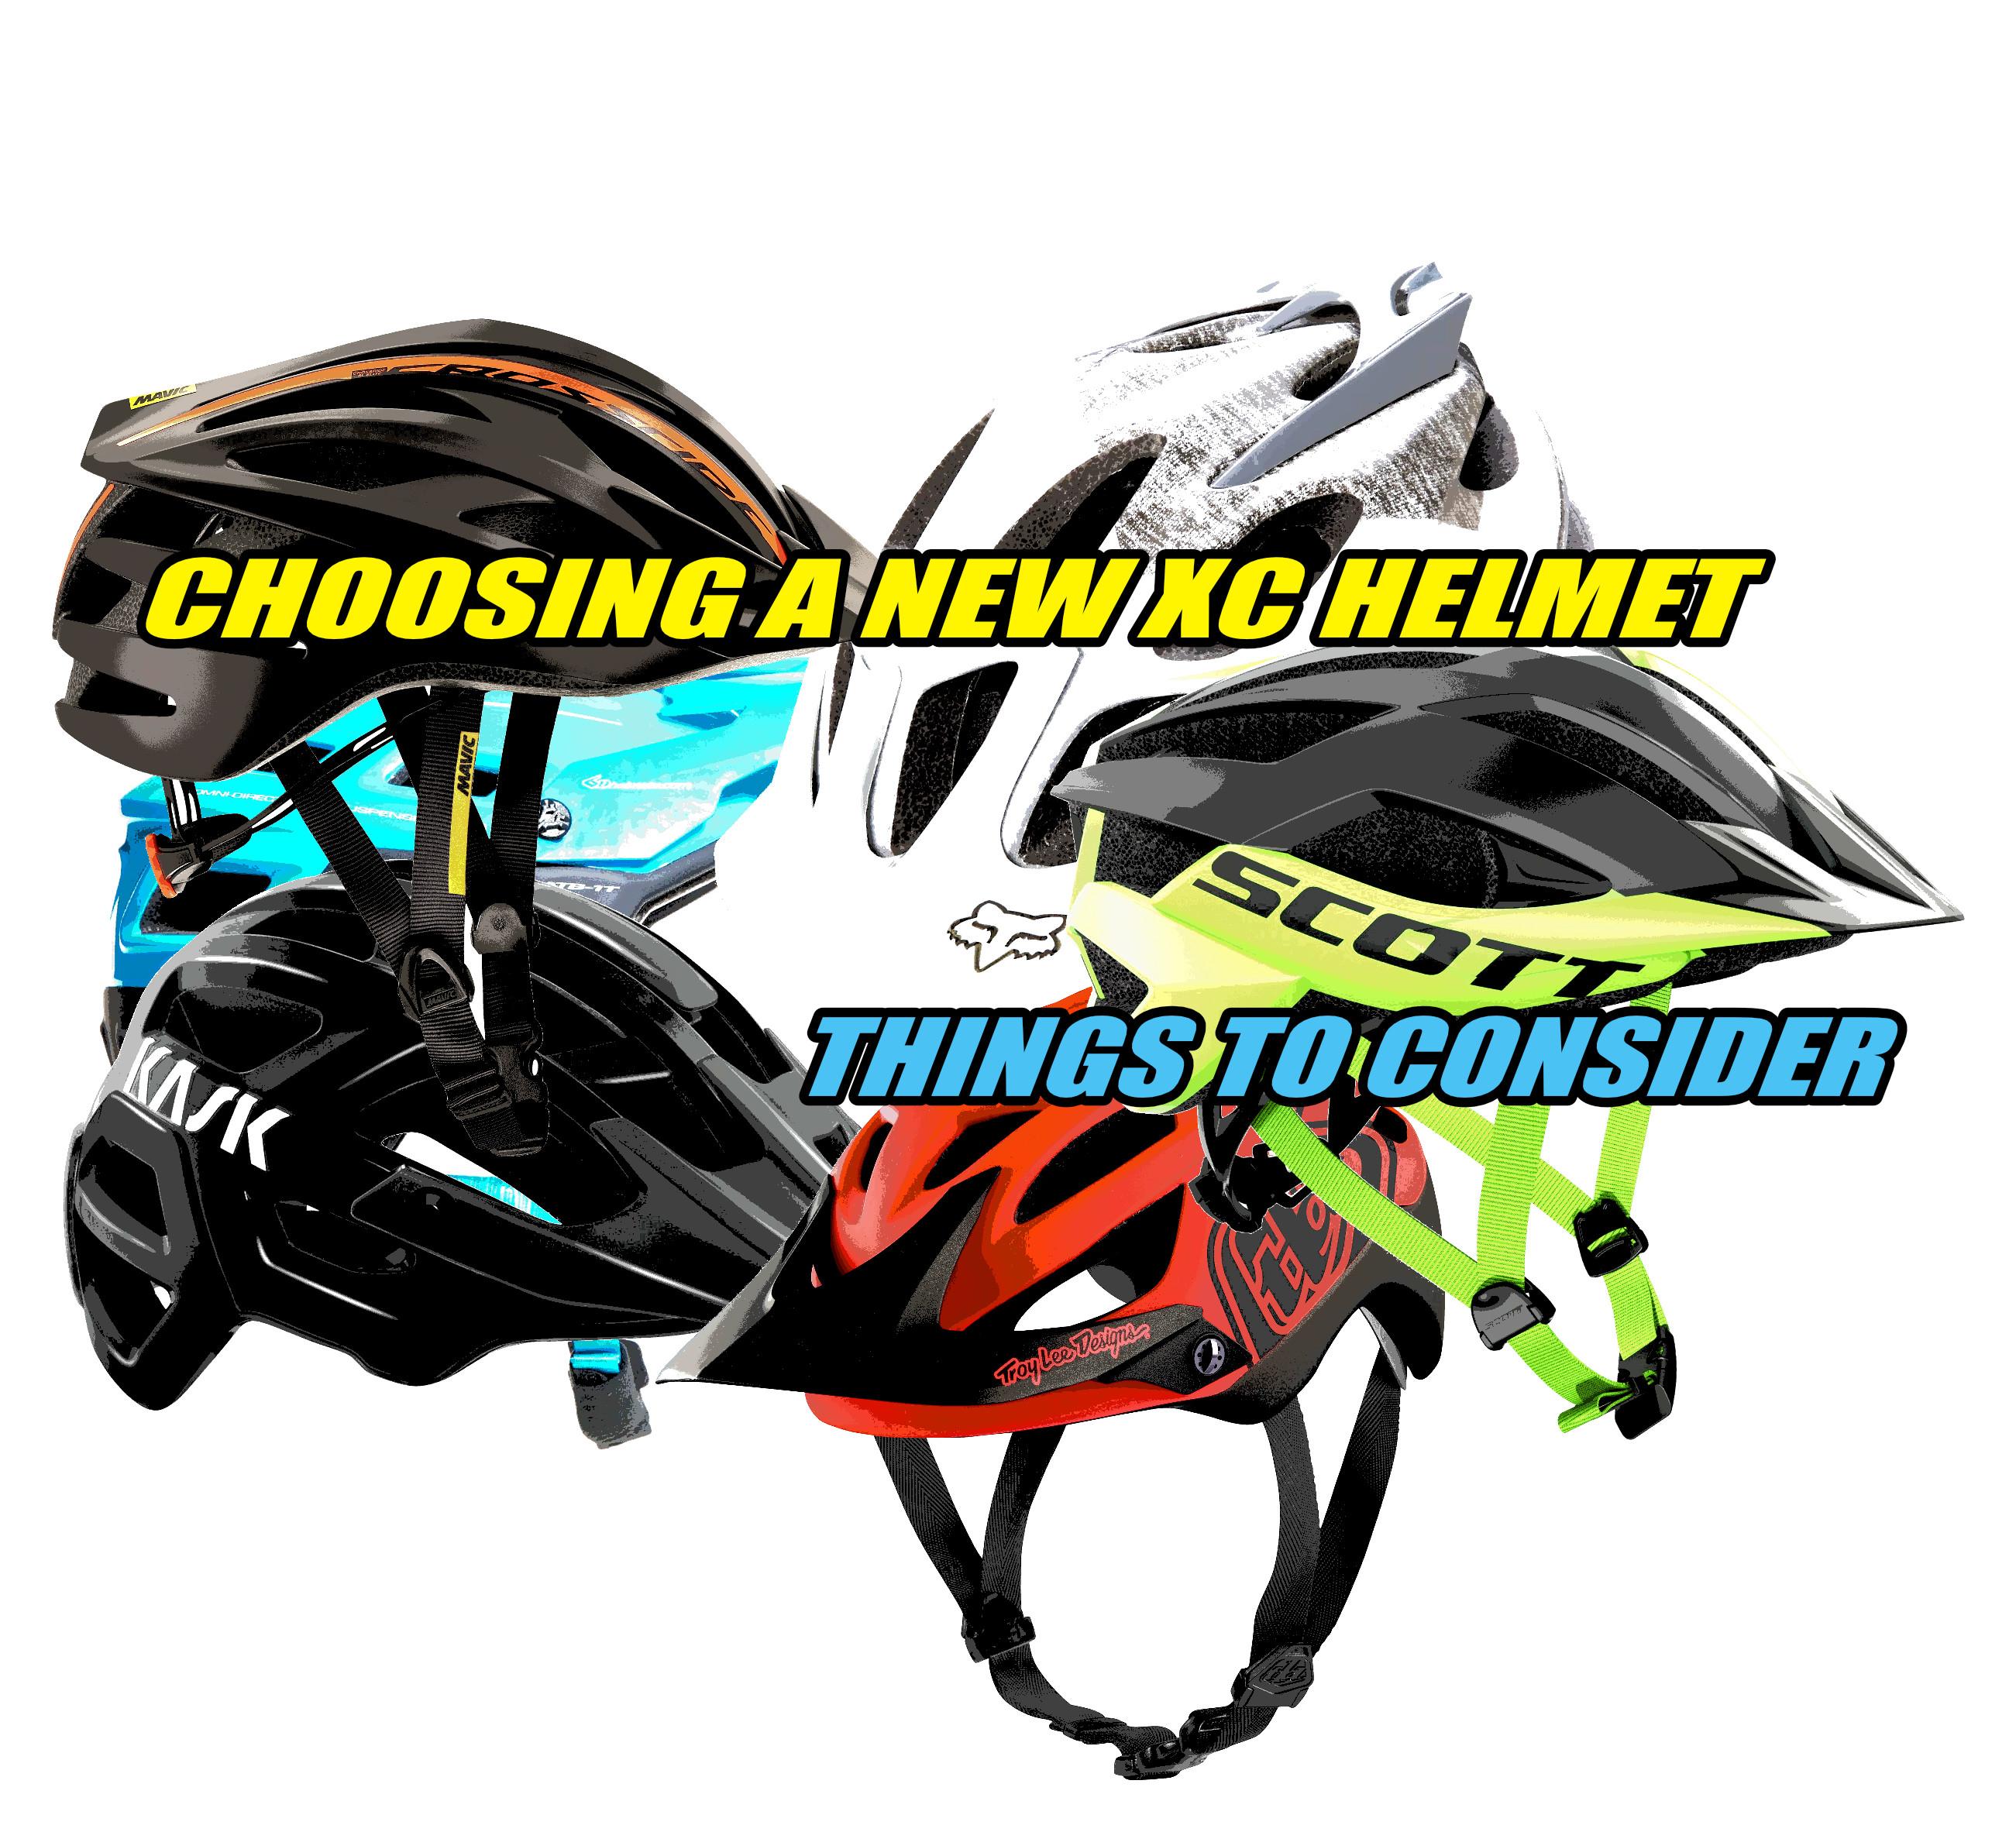 MTB xc new helmet